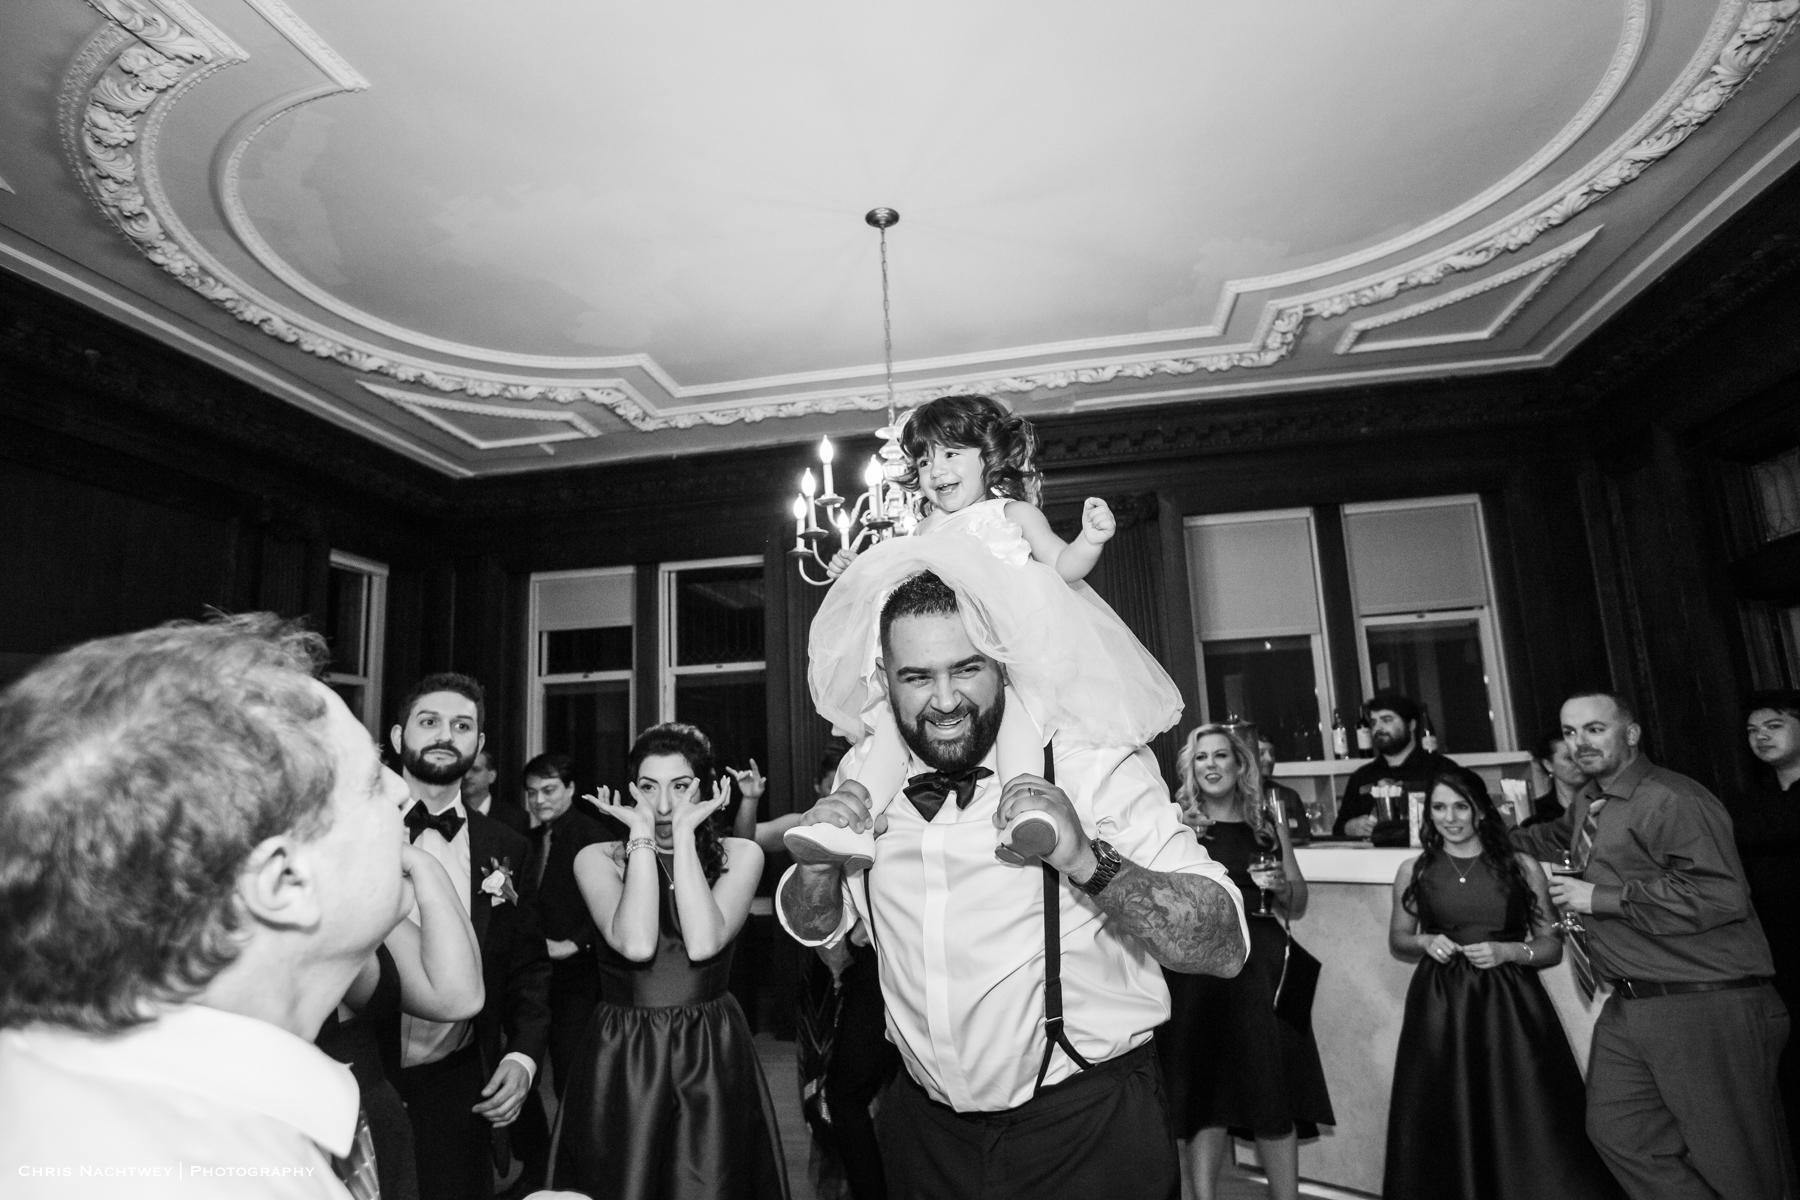 winter-branford-house-wedding-photos-groton-ct-chris-nachtwey-photography-2019-45.jpg